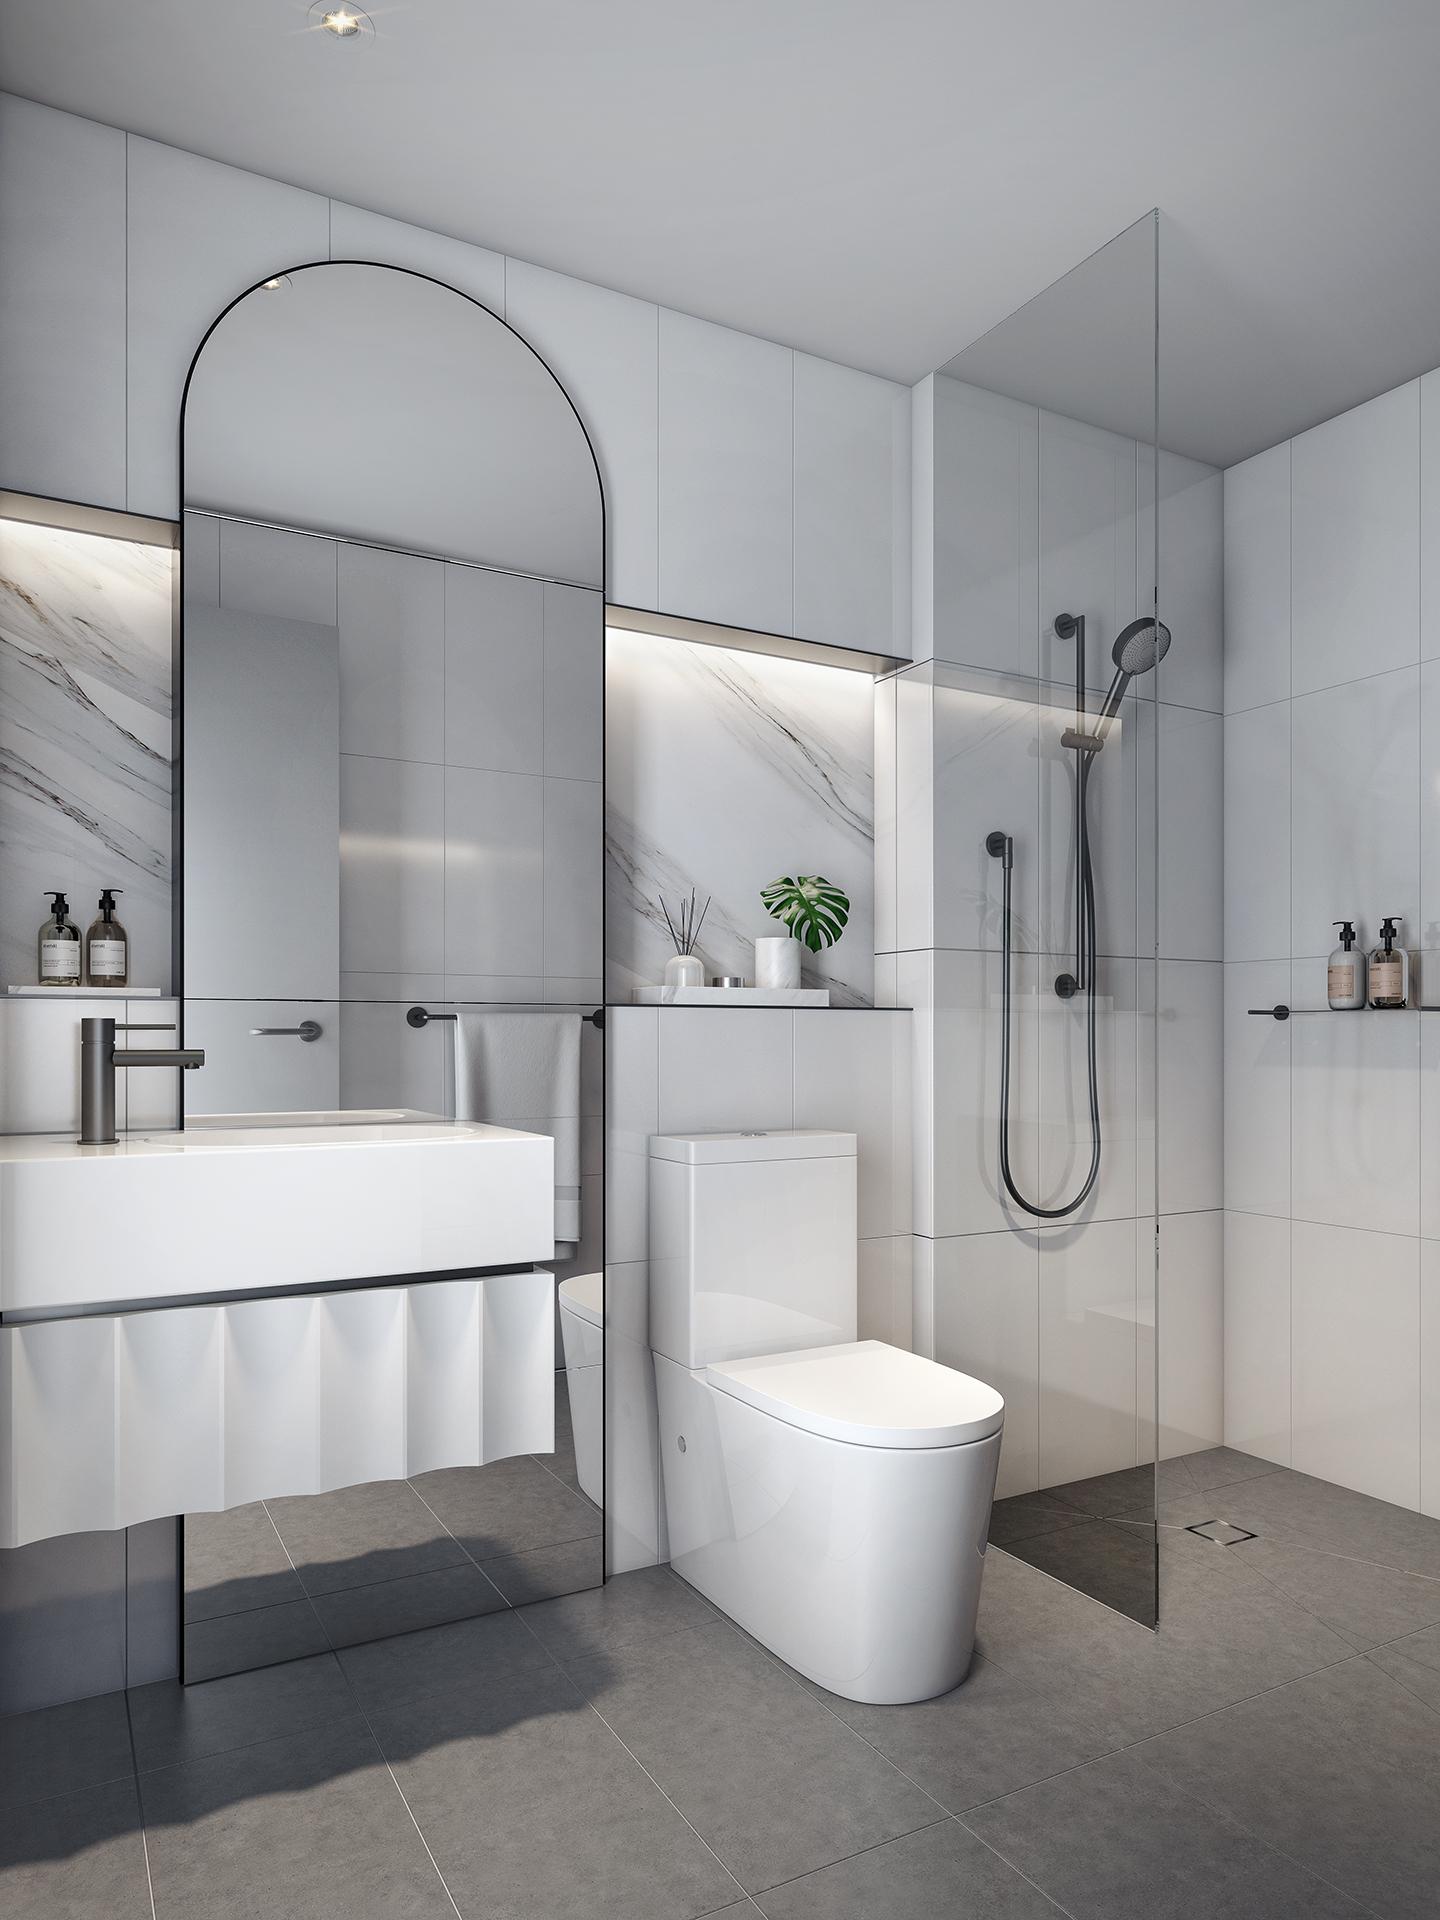 HOLD9998_Cobden St_IN03A_Apartment Bathr